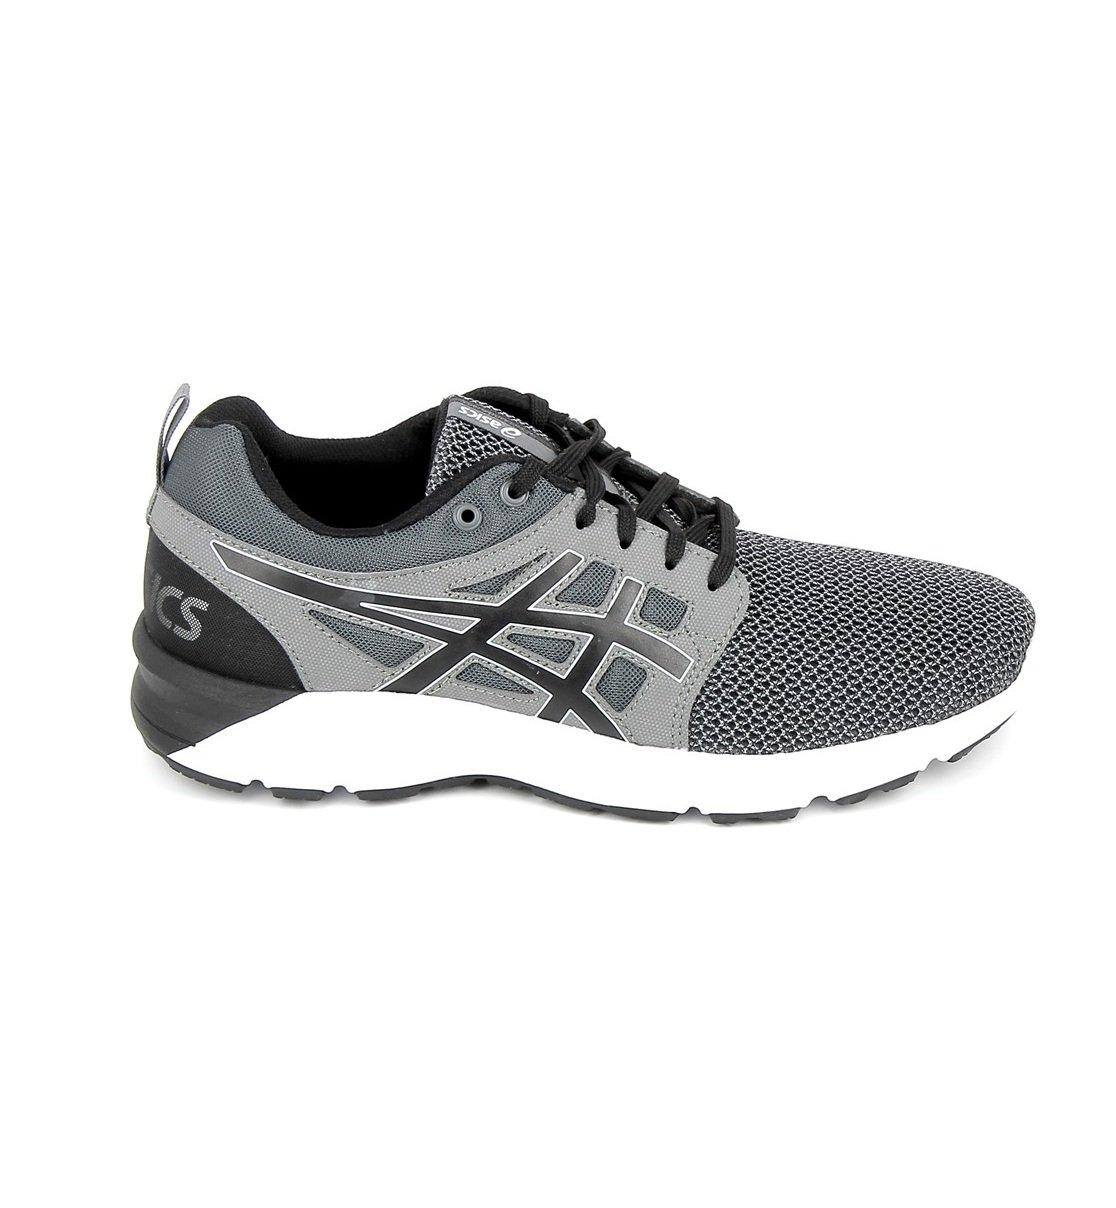 Zapatilla running hombre Asics Gel-Torrance (45, Negro) 45|gris carbone/noir/blanc